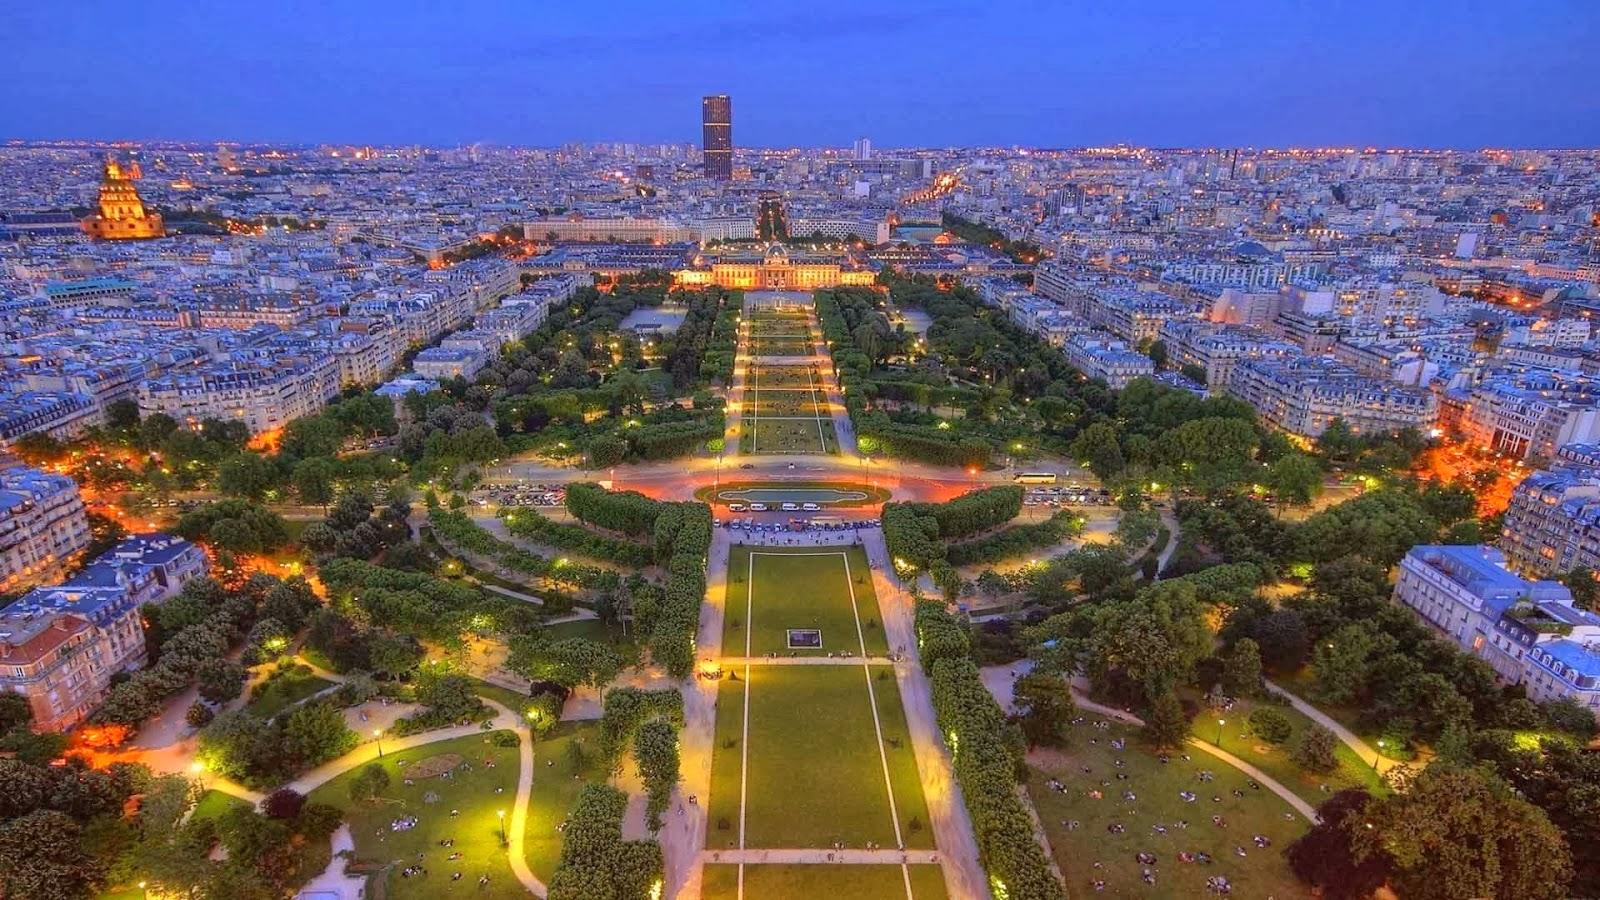 HD WALLPAPERS: Download Paris City HD Wallpapers In 1080p